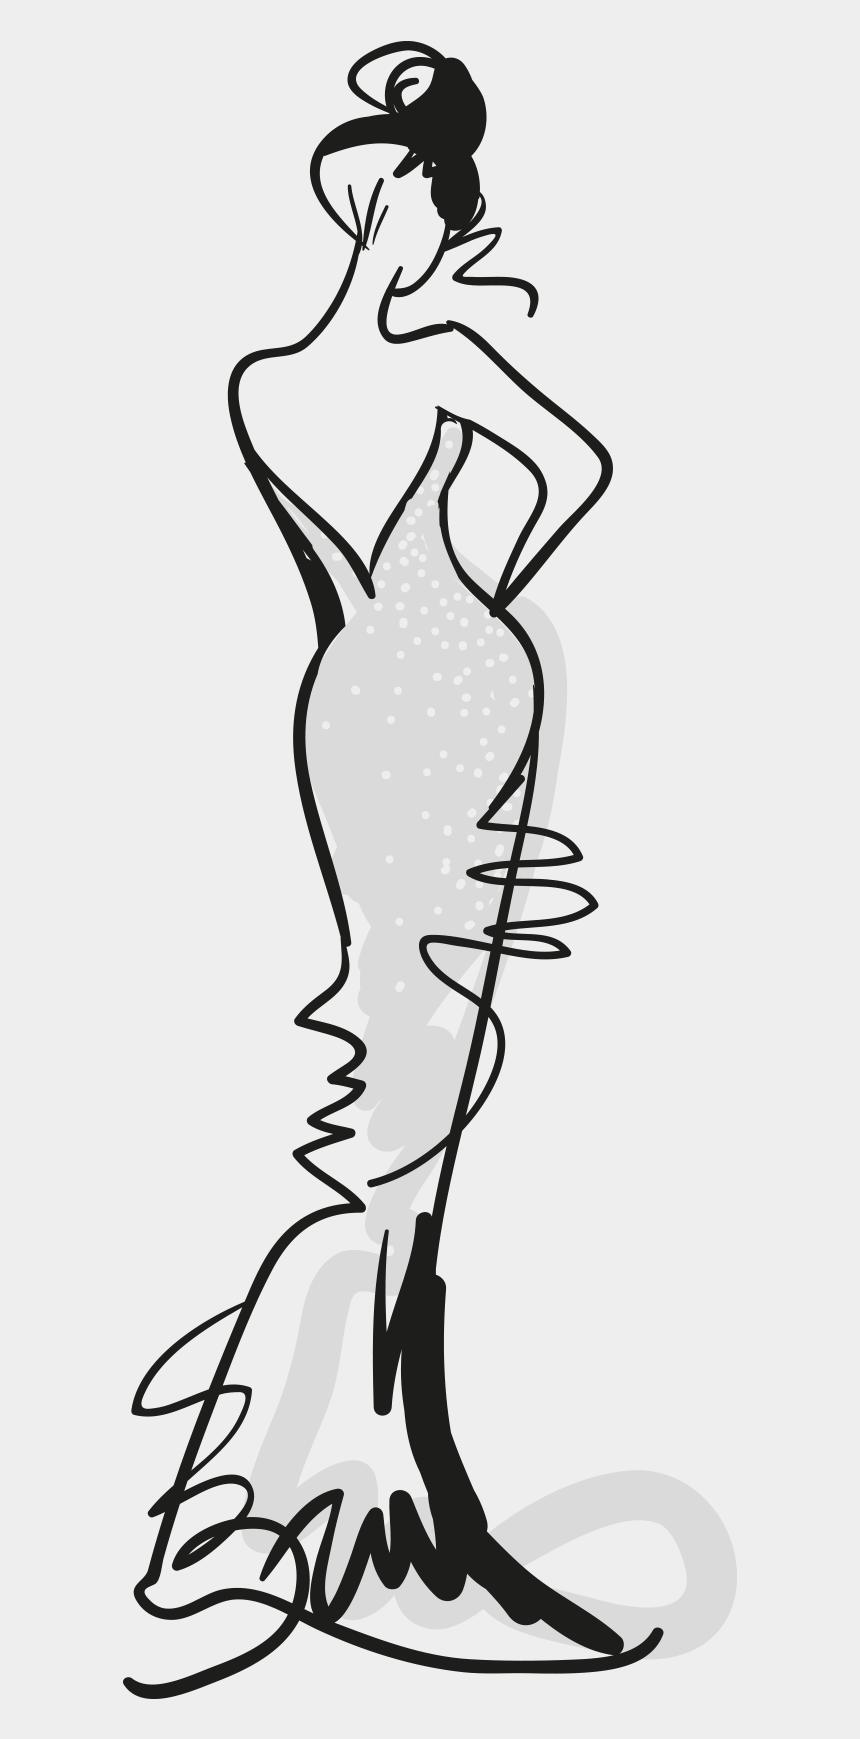 fashion clipart png, Cartoons - Fashion Clipart Transparent - Fashion Line Art Png